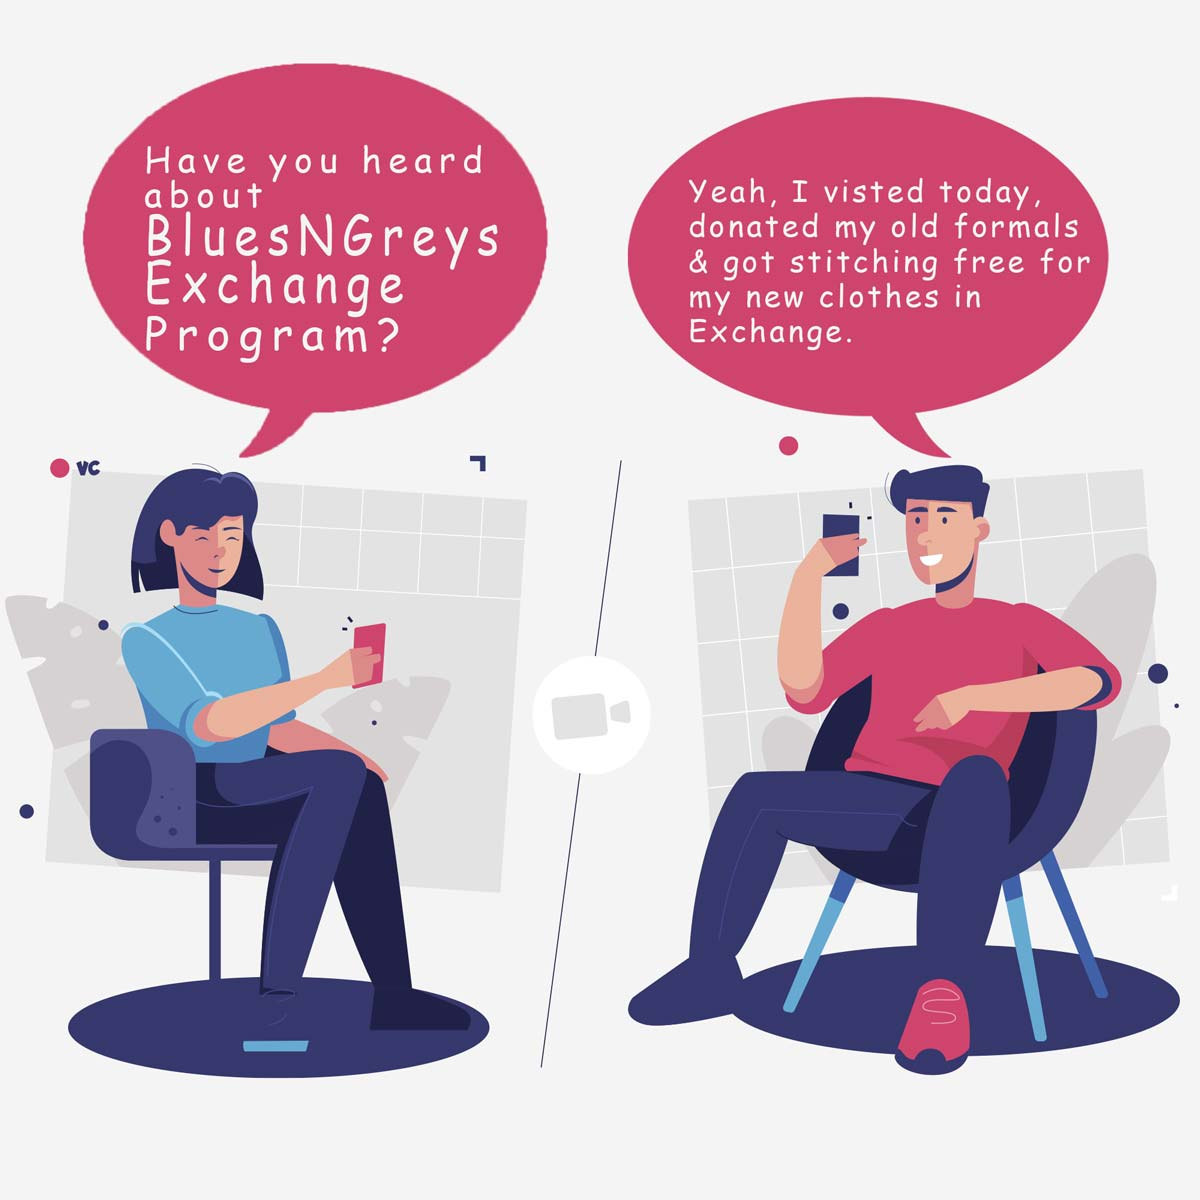 BluesNGreys-Exchange-Program-1